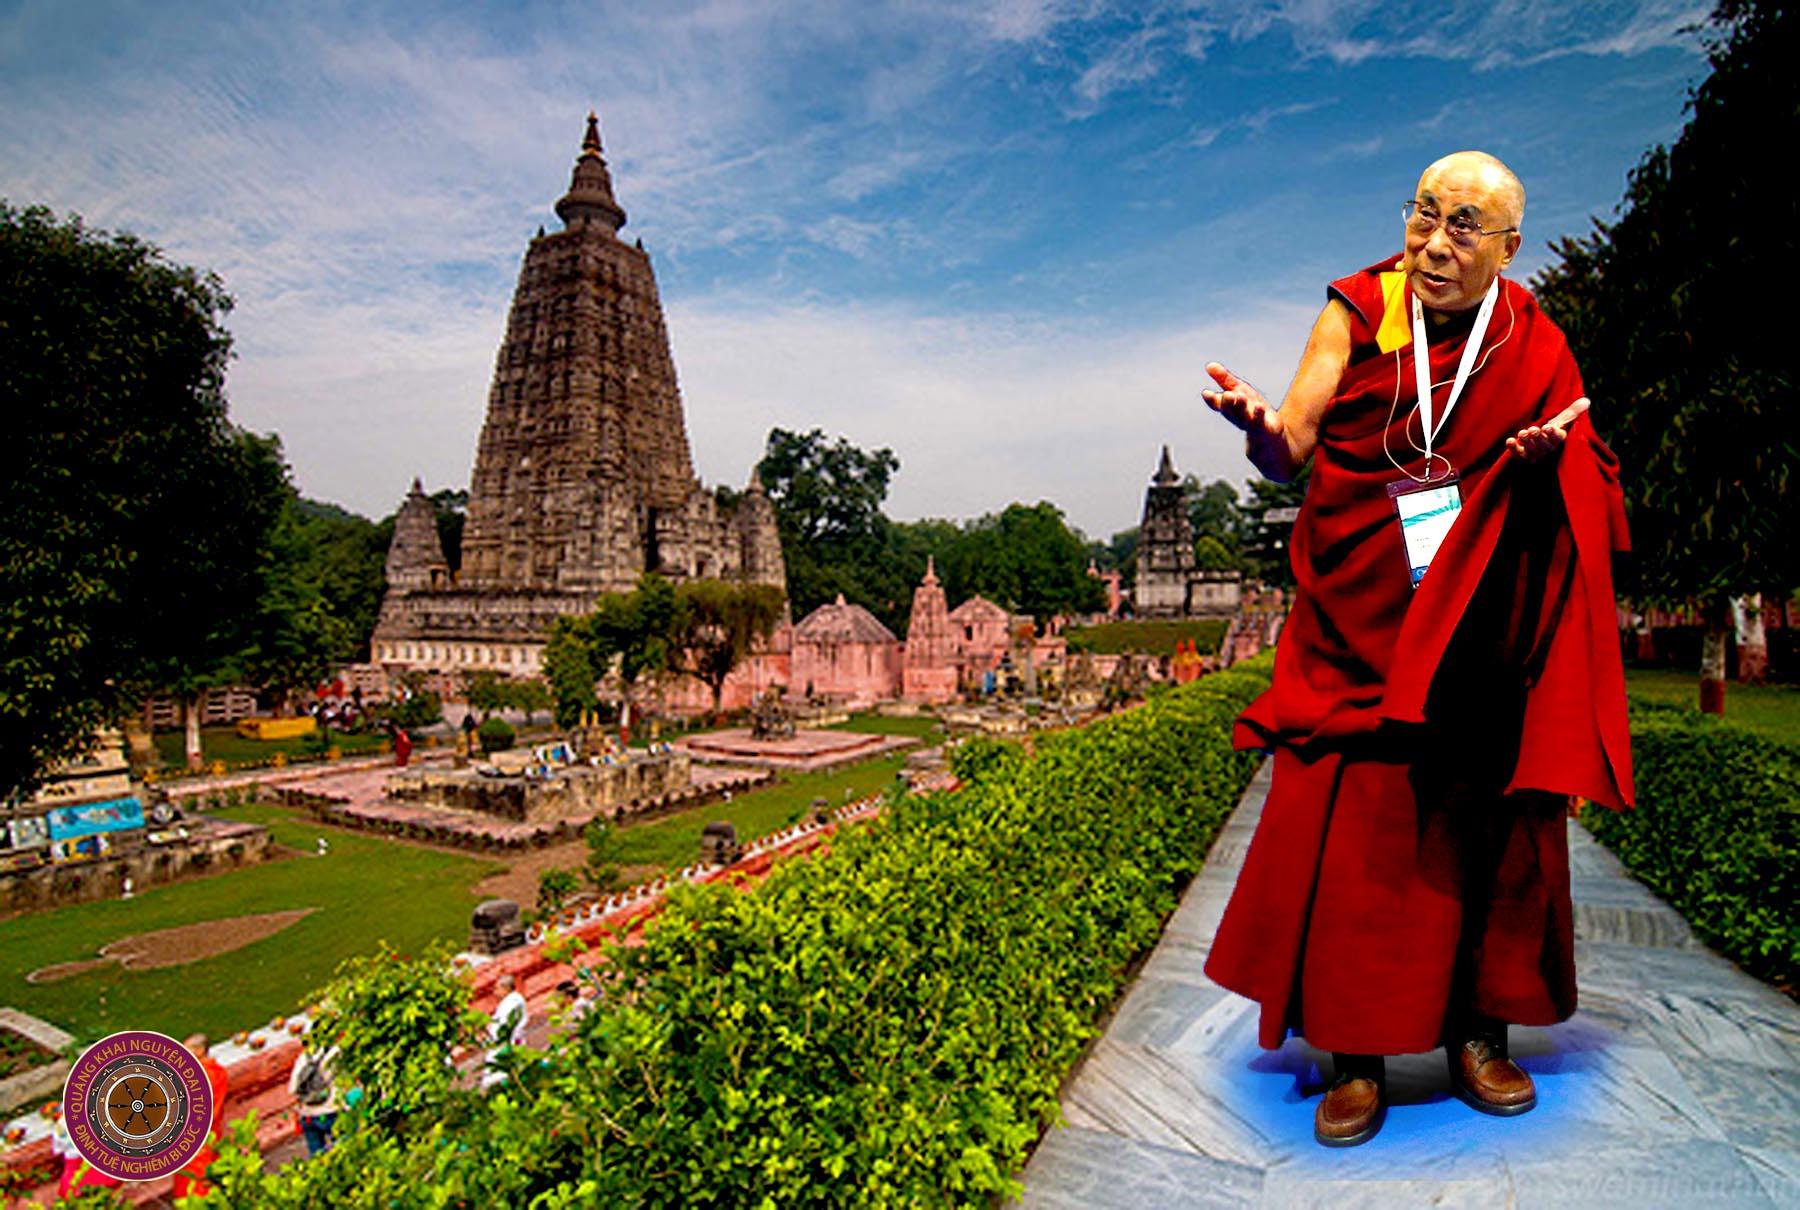 C:\Users\Tu Duc\Pictures\2011-11-14 reflectionA\Dalai Lama\6 lienhebaidich\Bodhgaya4.jpg